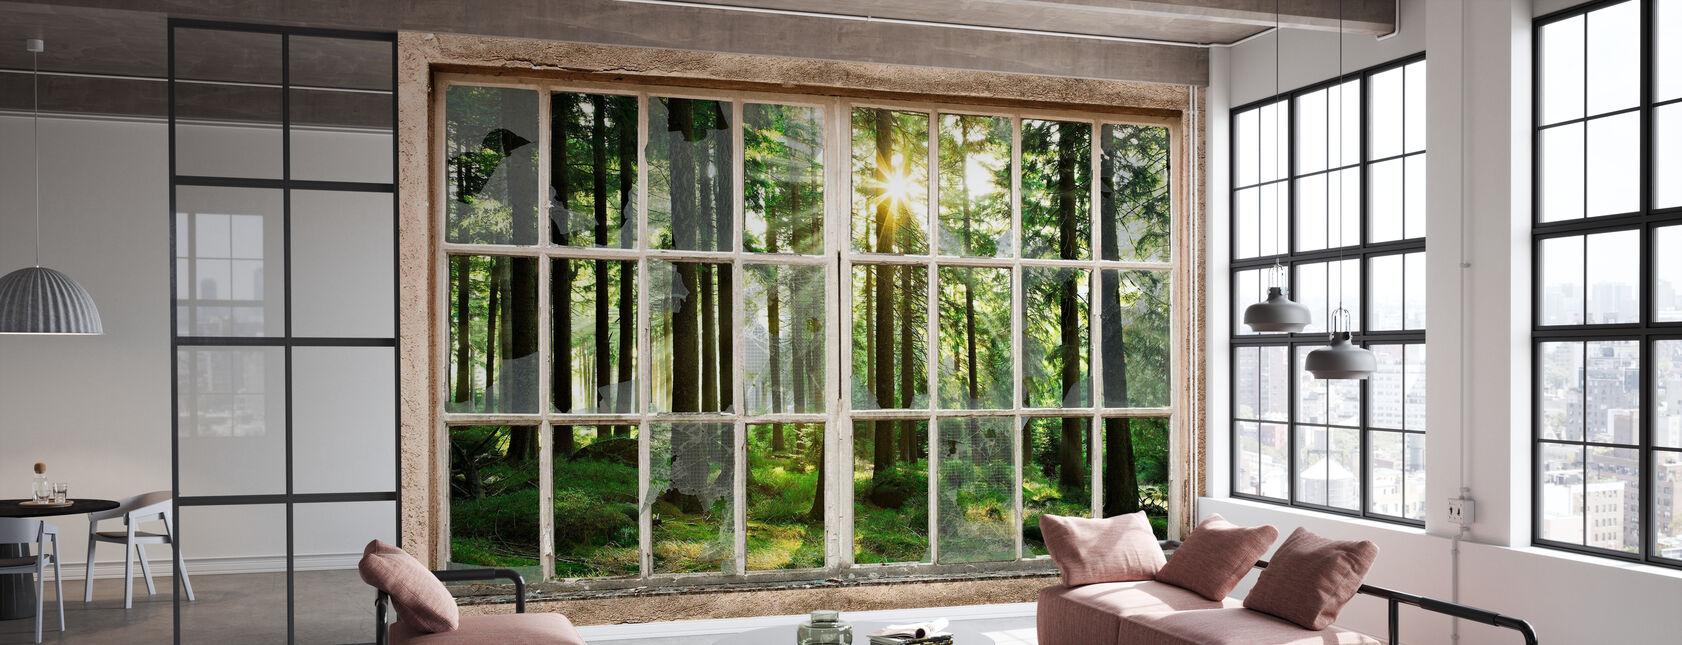 Sunset in Forest Through Broken Window - Wallpaper - Office